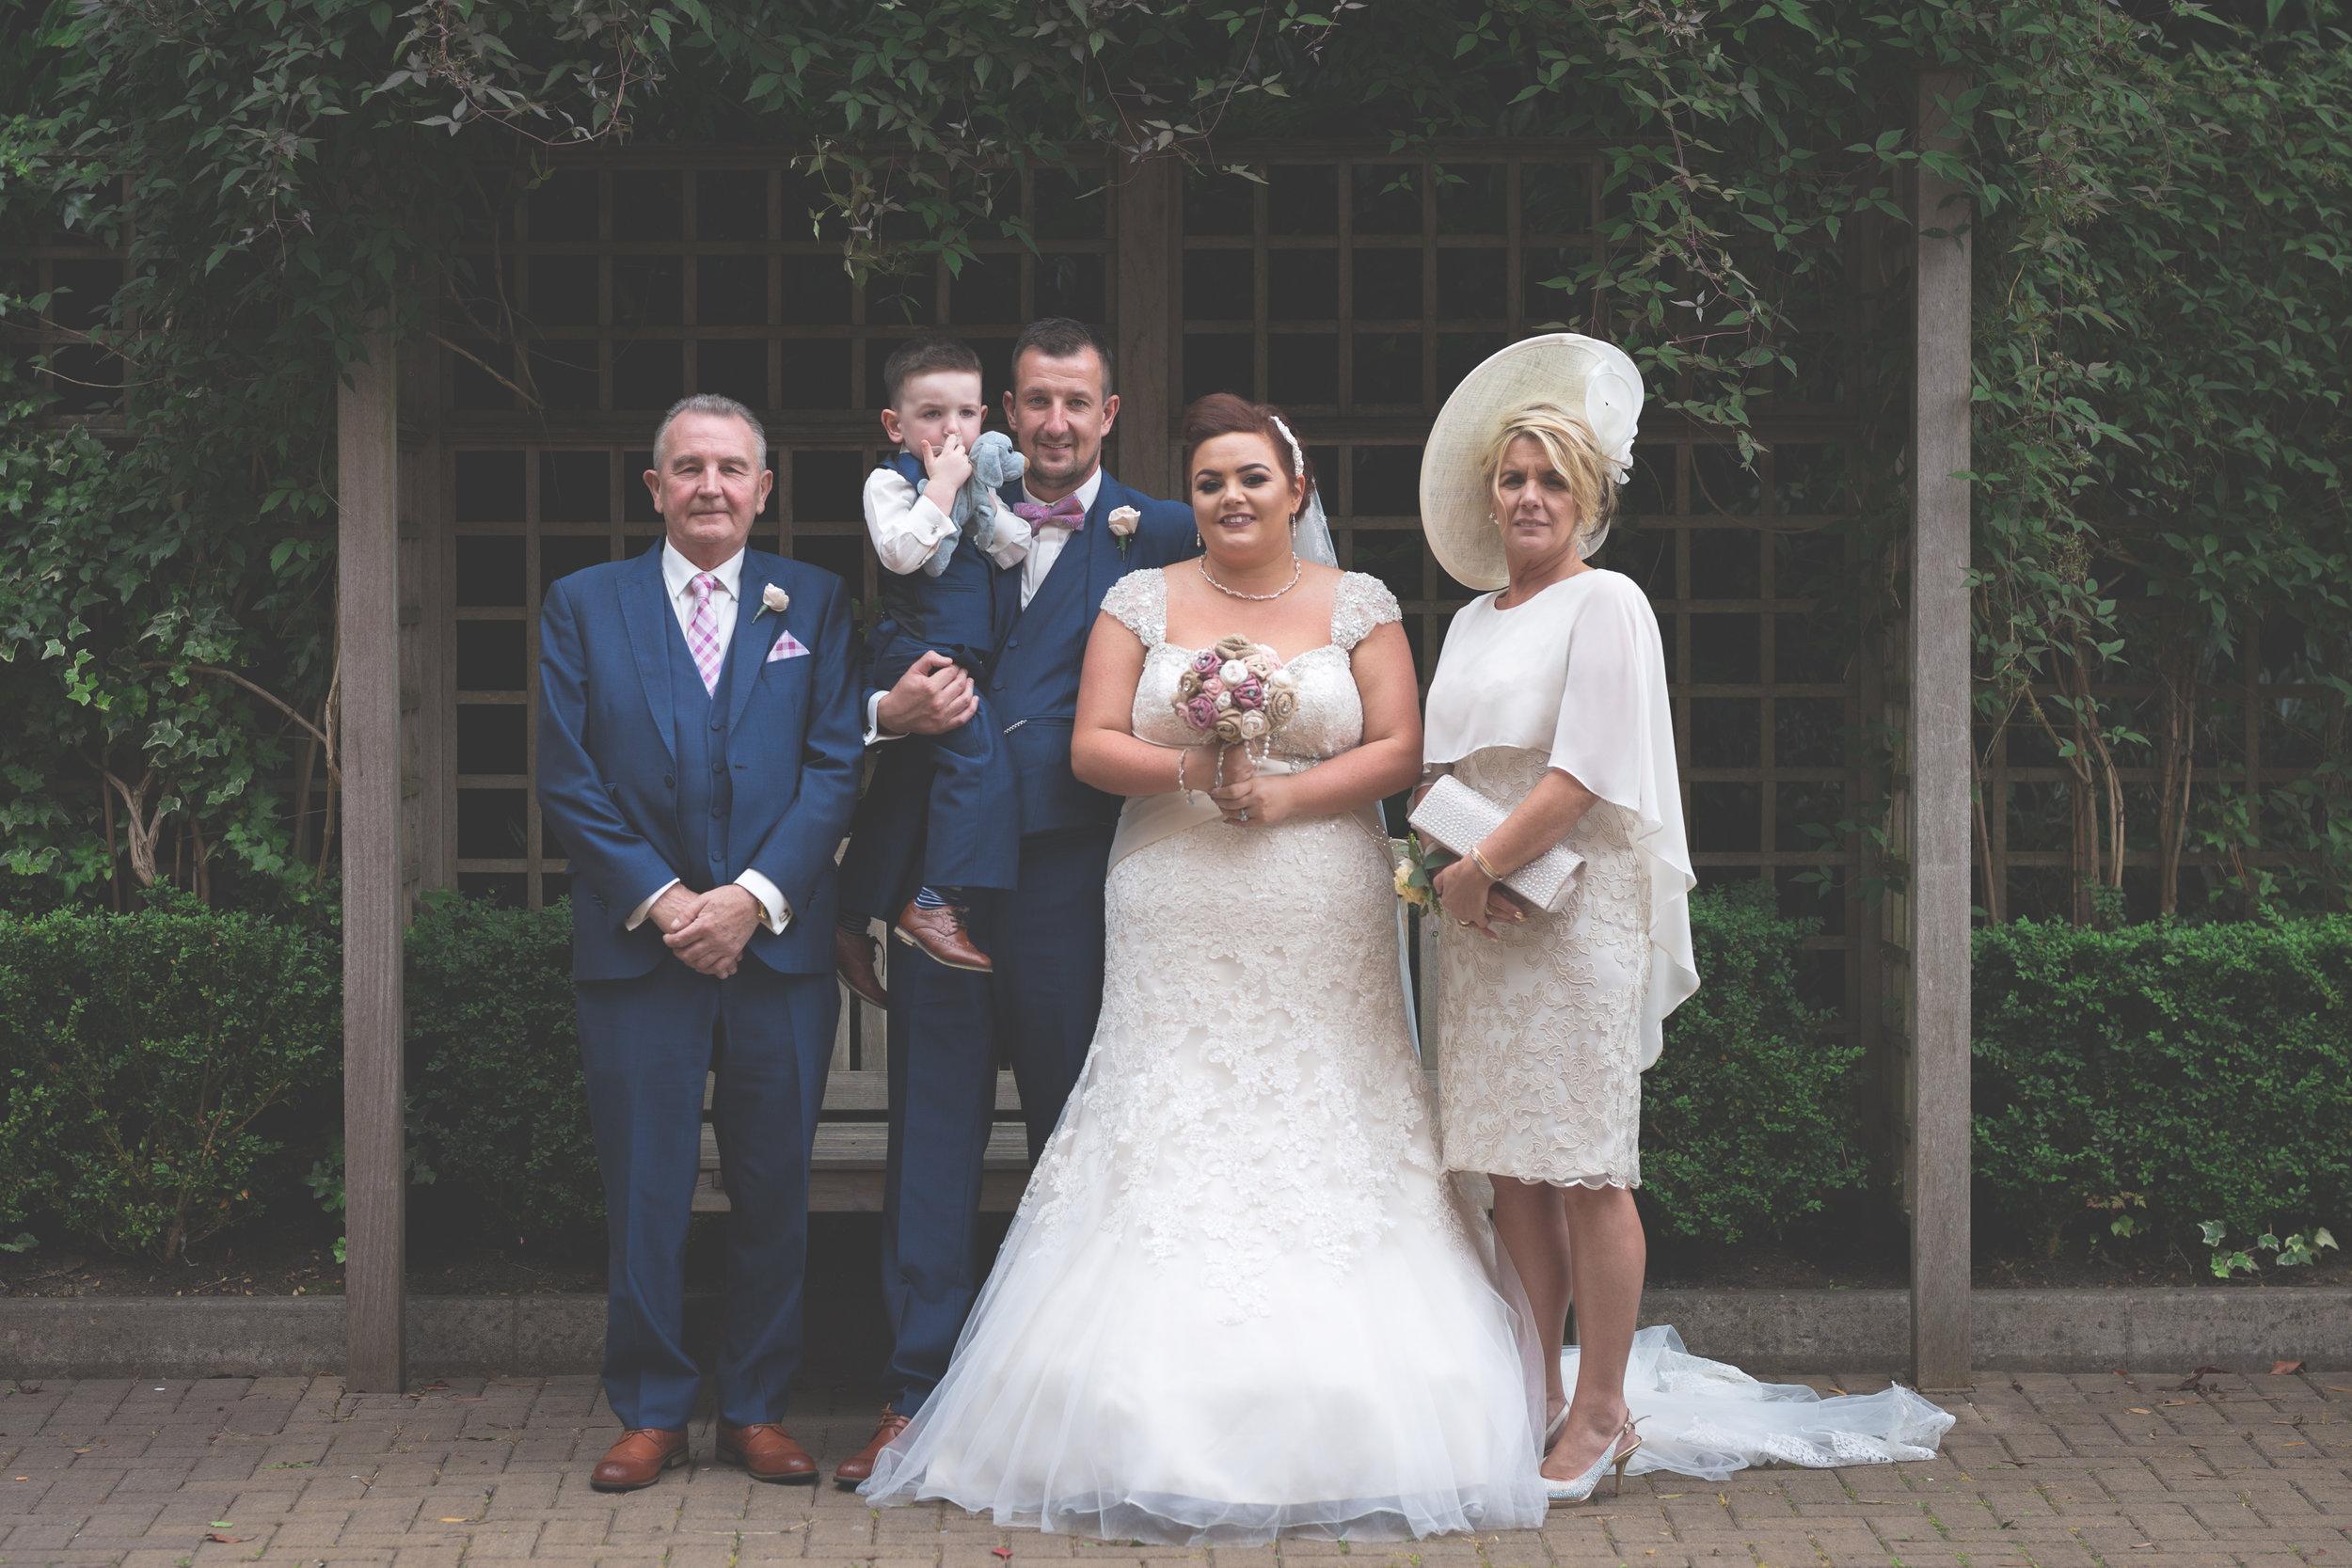 Antoinette & Stephen - Portraits   Brian McEwan Photography   Wedding Photographer Northern Ireland 56.jpg